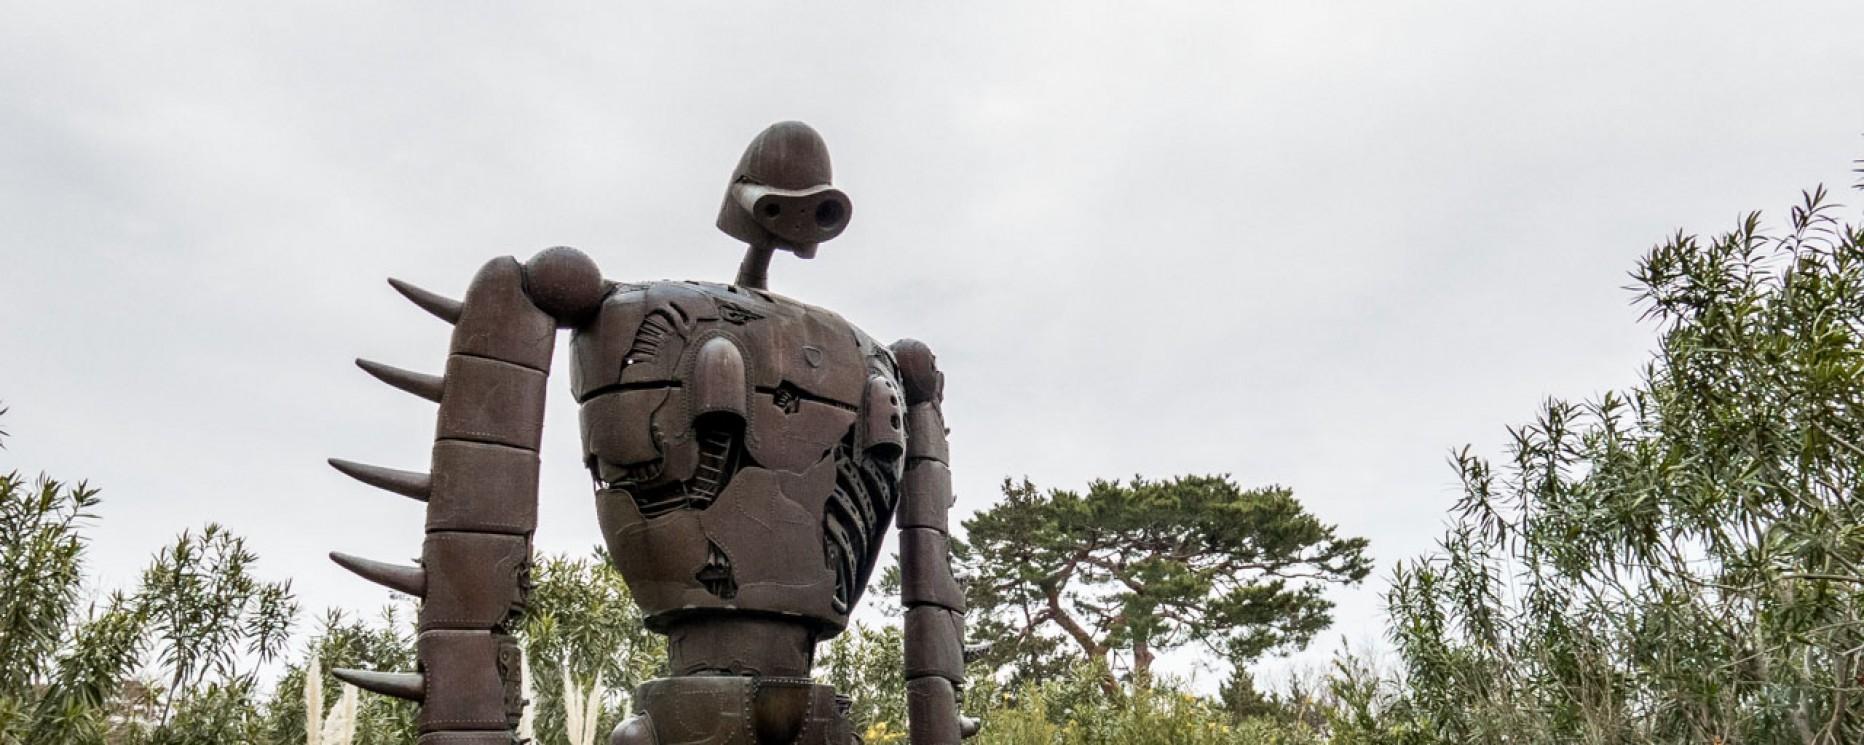 TOKYO – Visiter le musée Ghibli